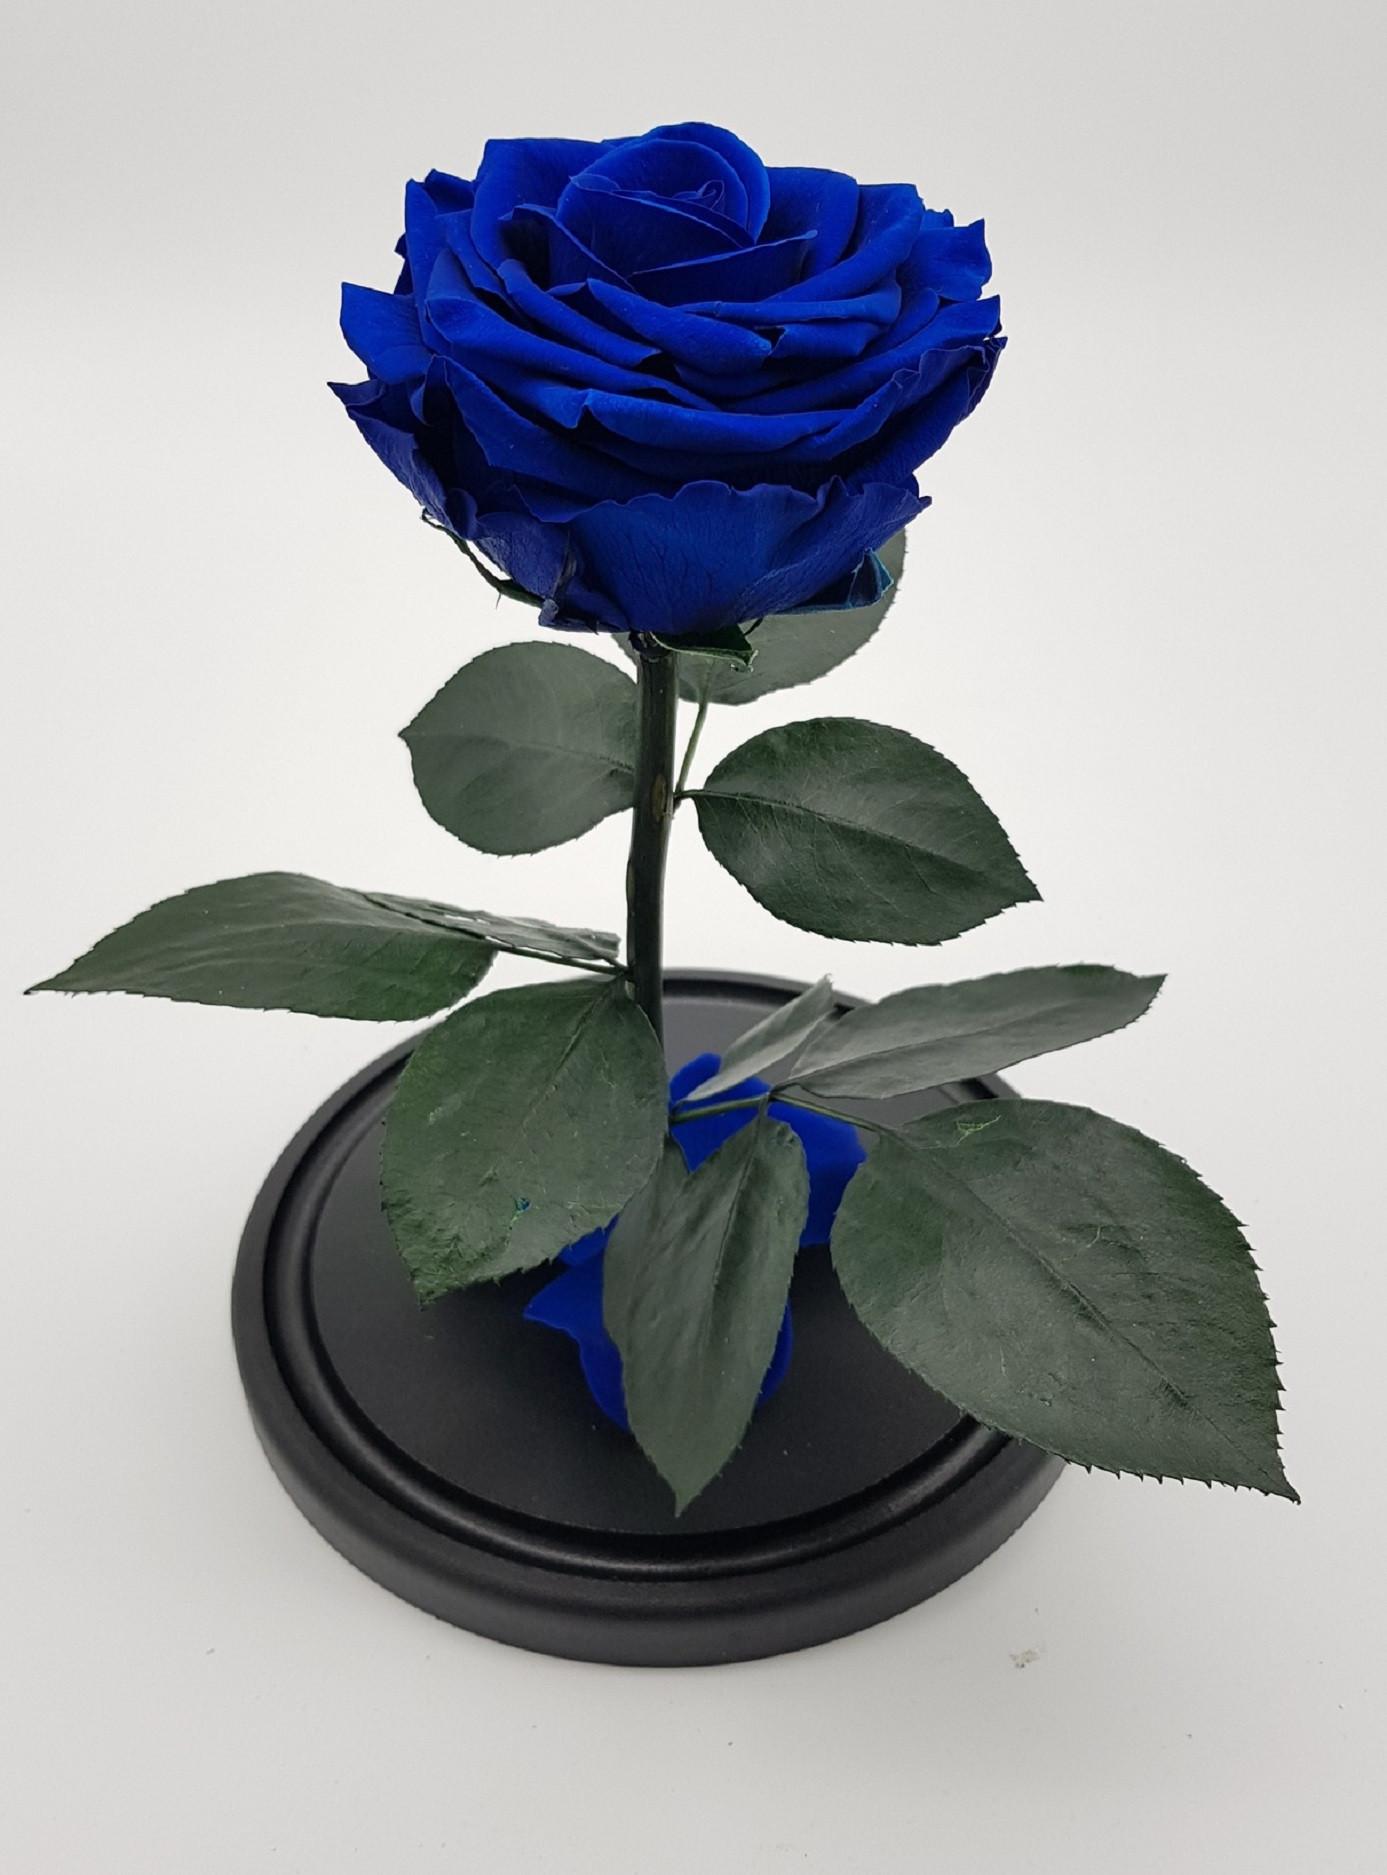 Роза в колбе премиум 7-8 Синяя 27*15*8 см